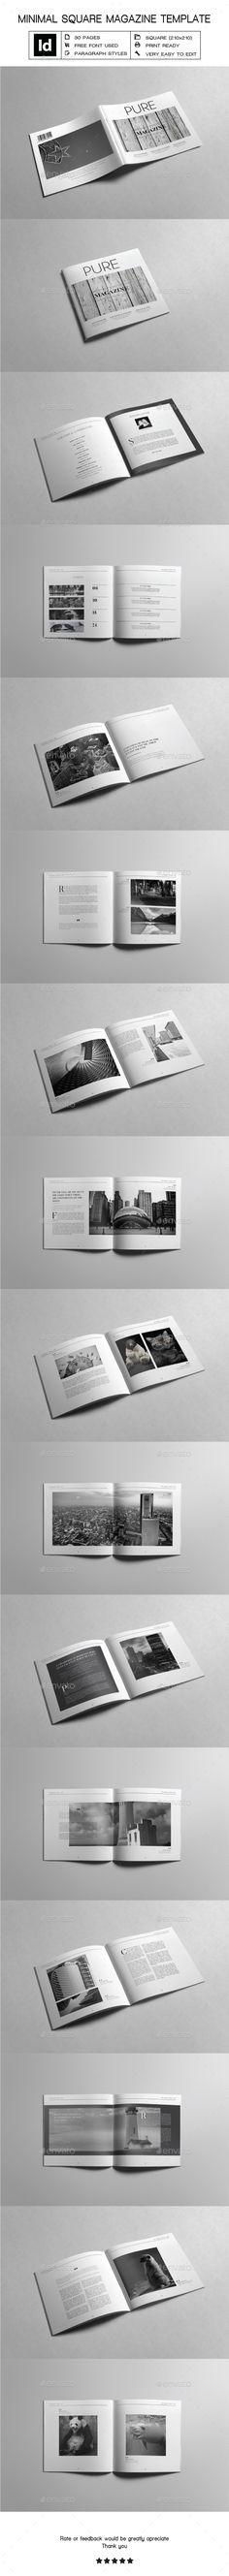 Minimal Square Magazine Template InDesign INDD V Magazine, Magazine Design, Fashion Magazine Cover, Magazine Covers, Ideas Magazine, Design Set, Print Design, Indesign Templates, Print Templates